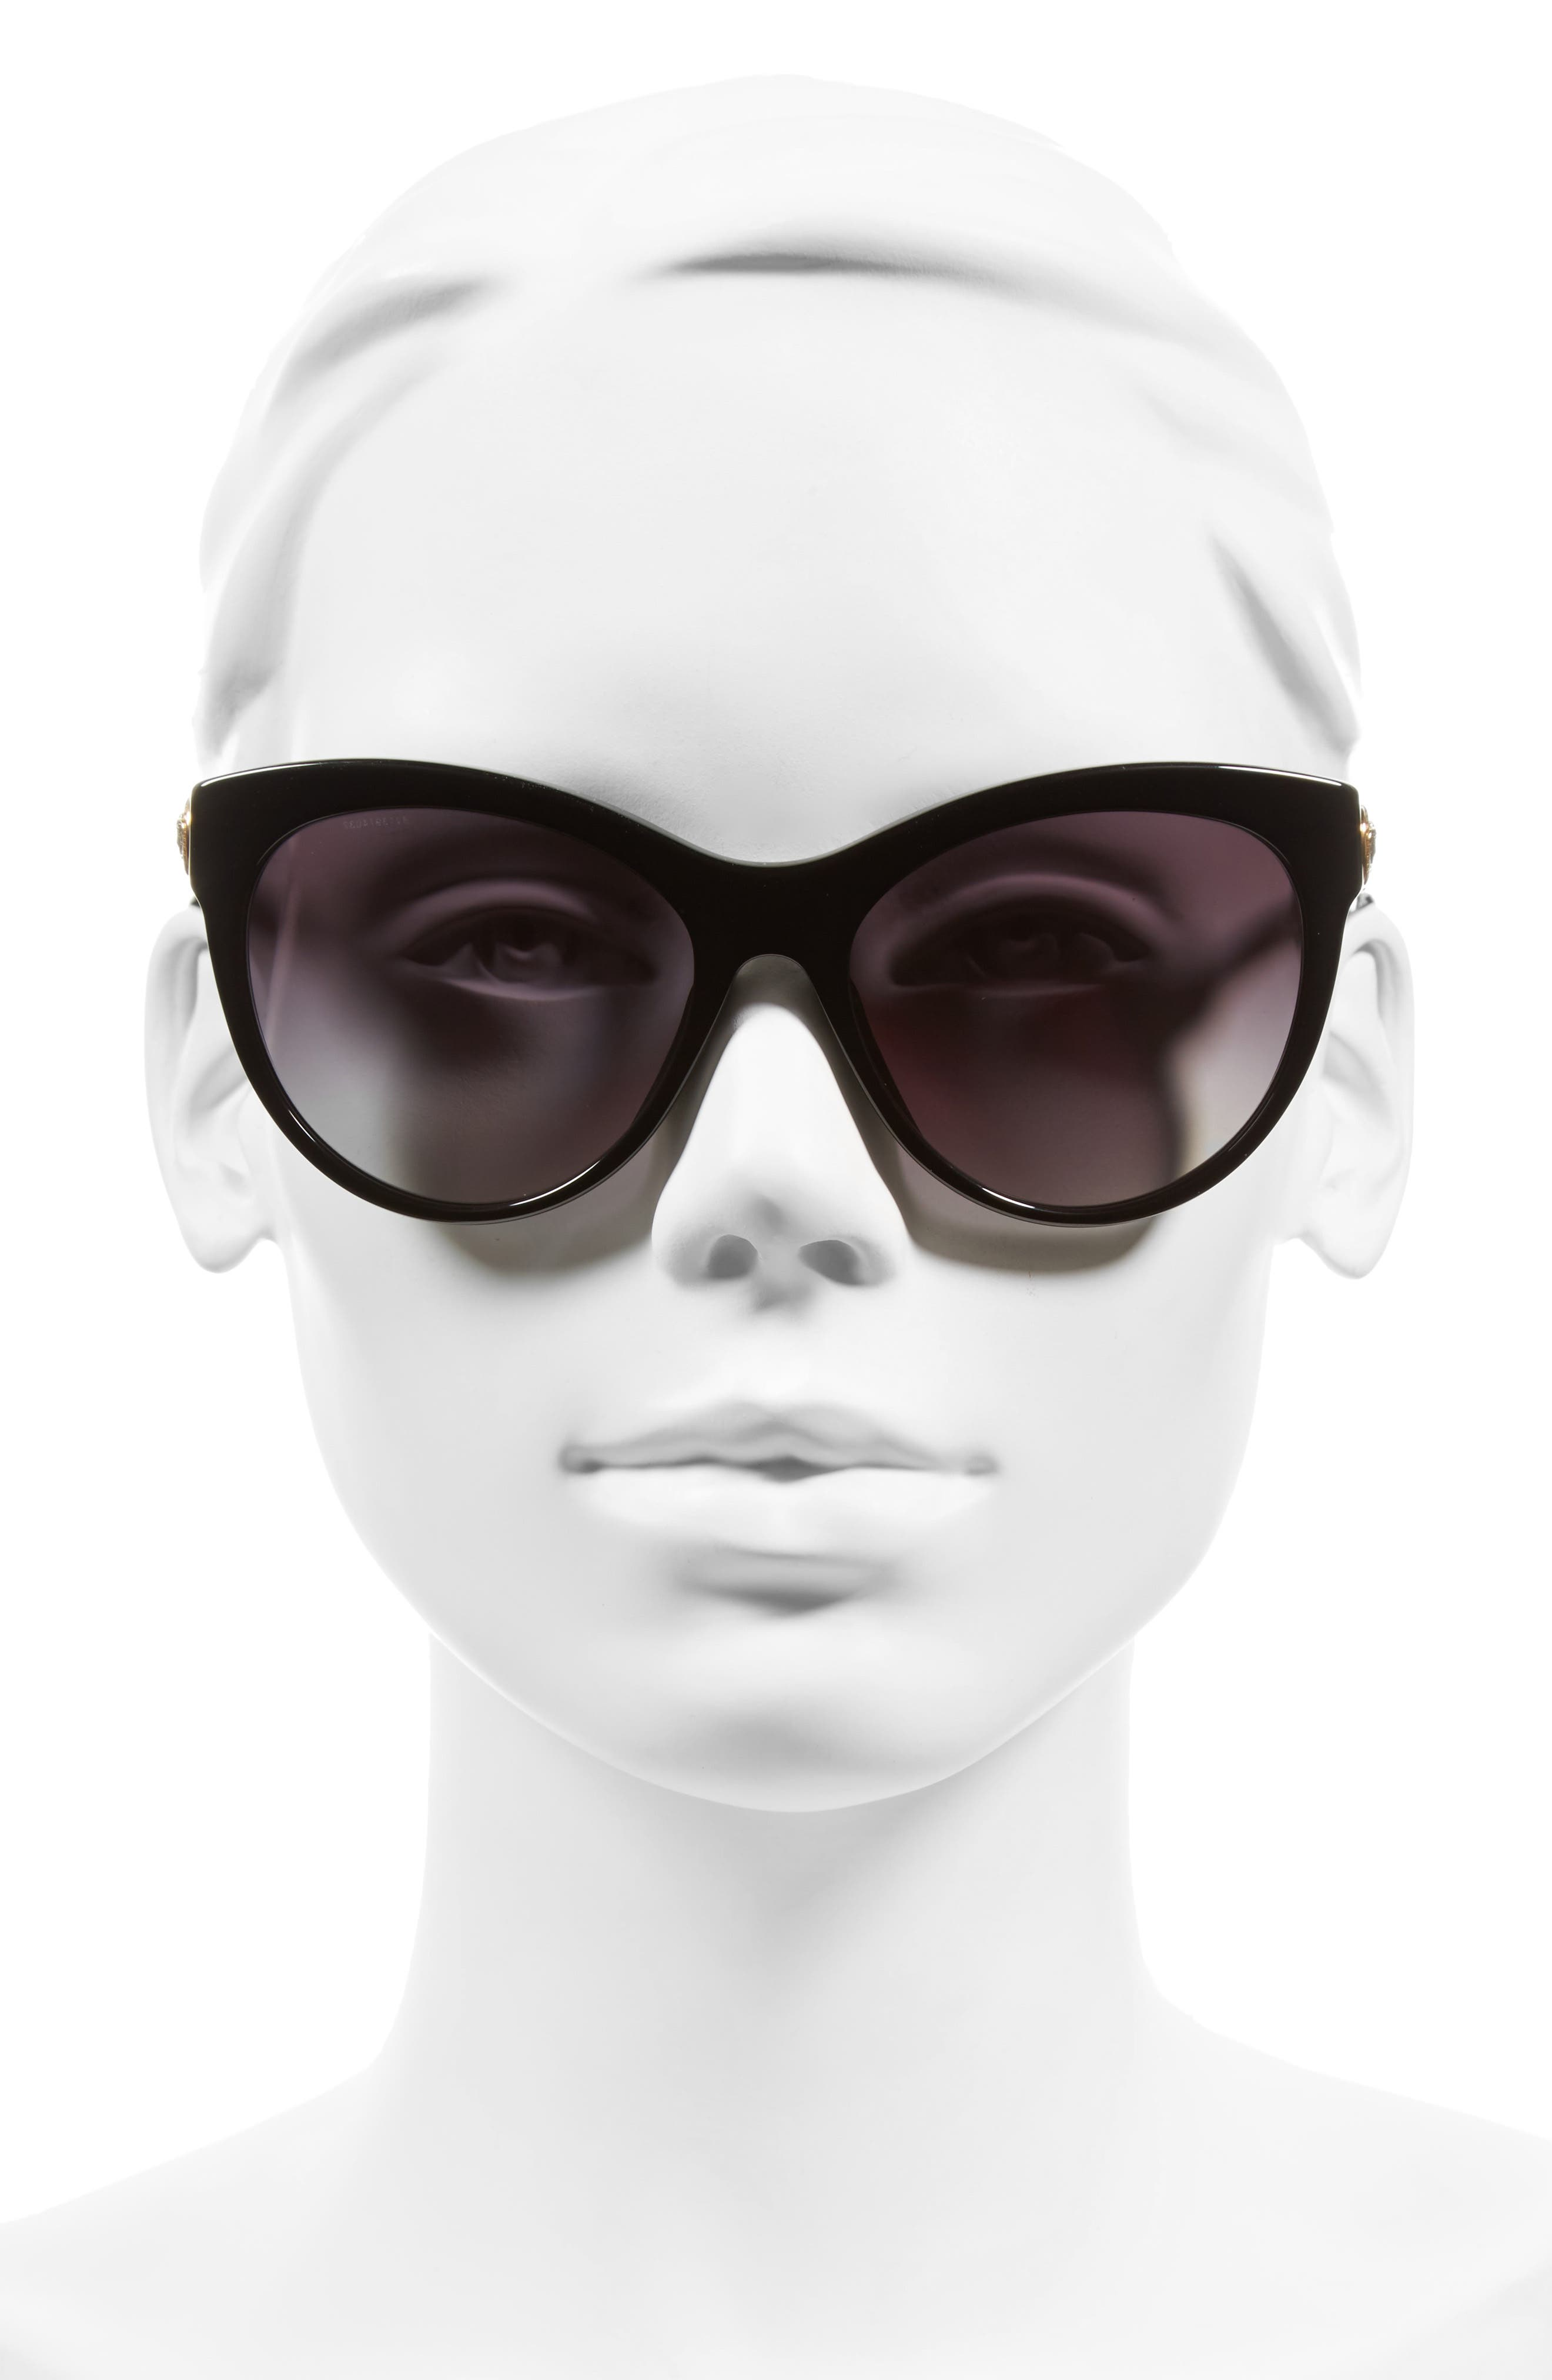 57mm Cat Eye Sunglasses,                             Alternate thumbnail 2, color,                             001